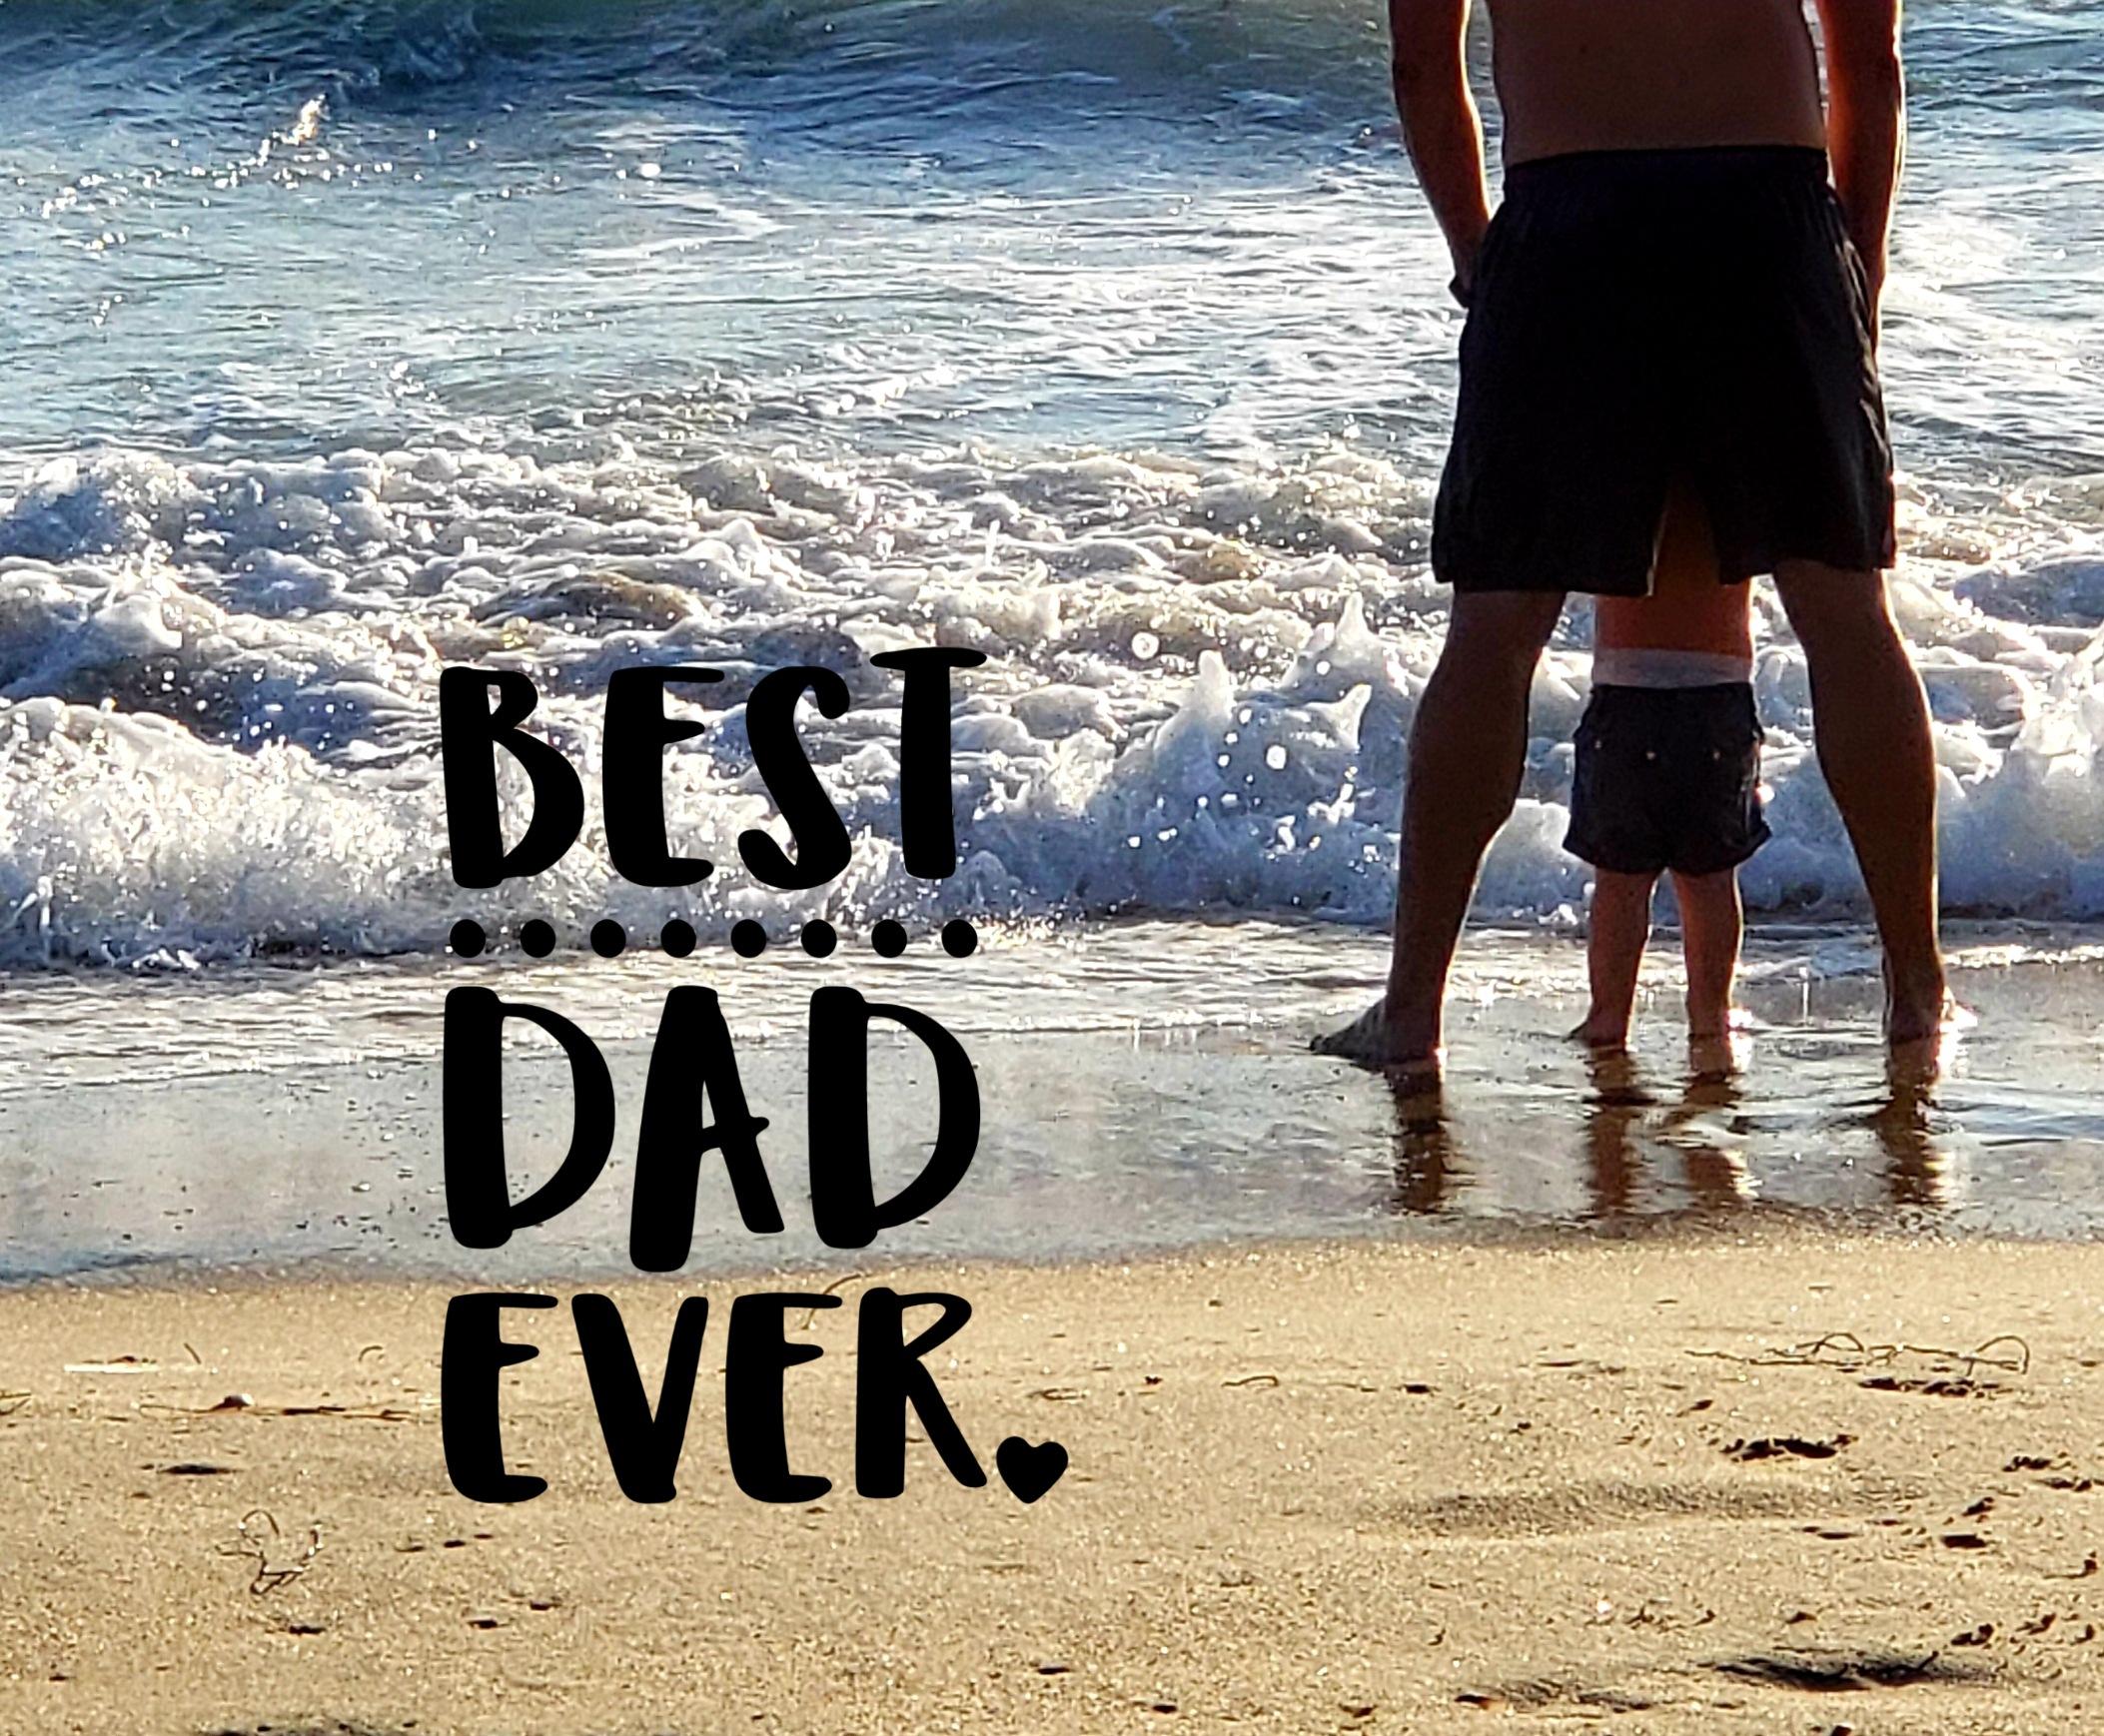 #fathersday #fatherandson #beachday #bestdadever #picsart #father #ocean #myoriginalphoto #freetoedit